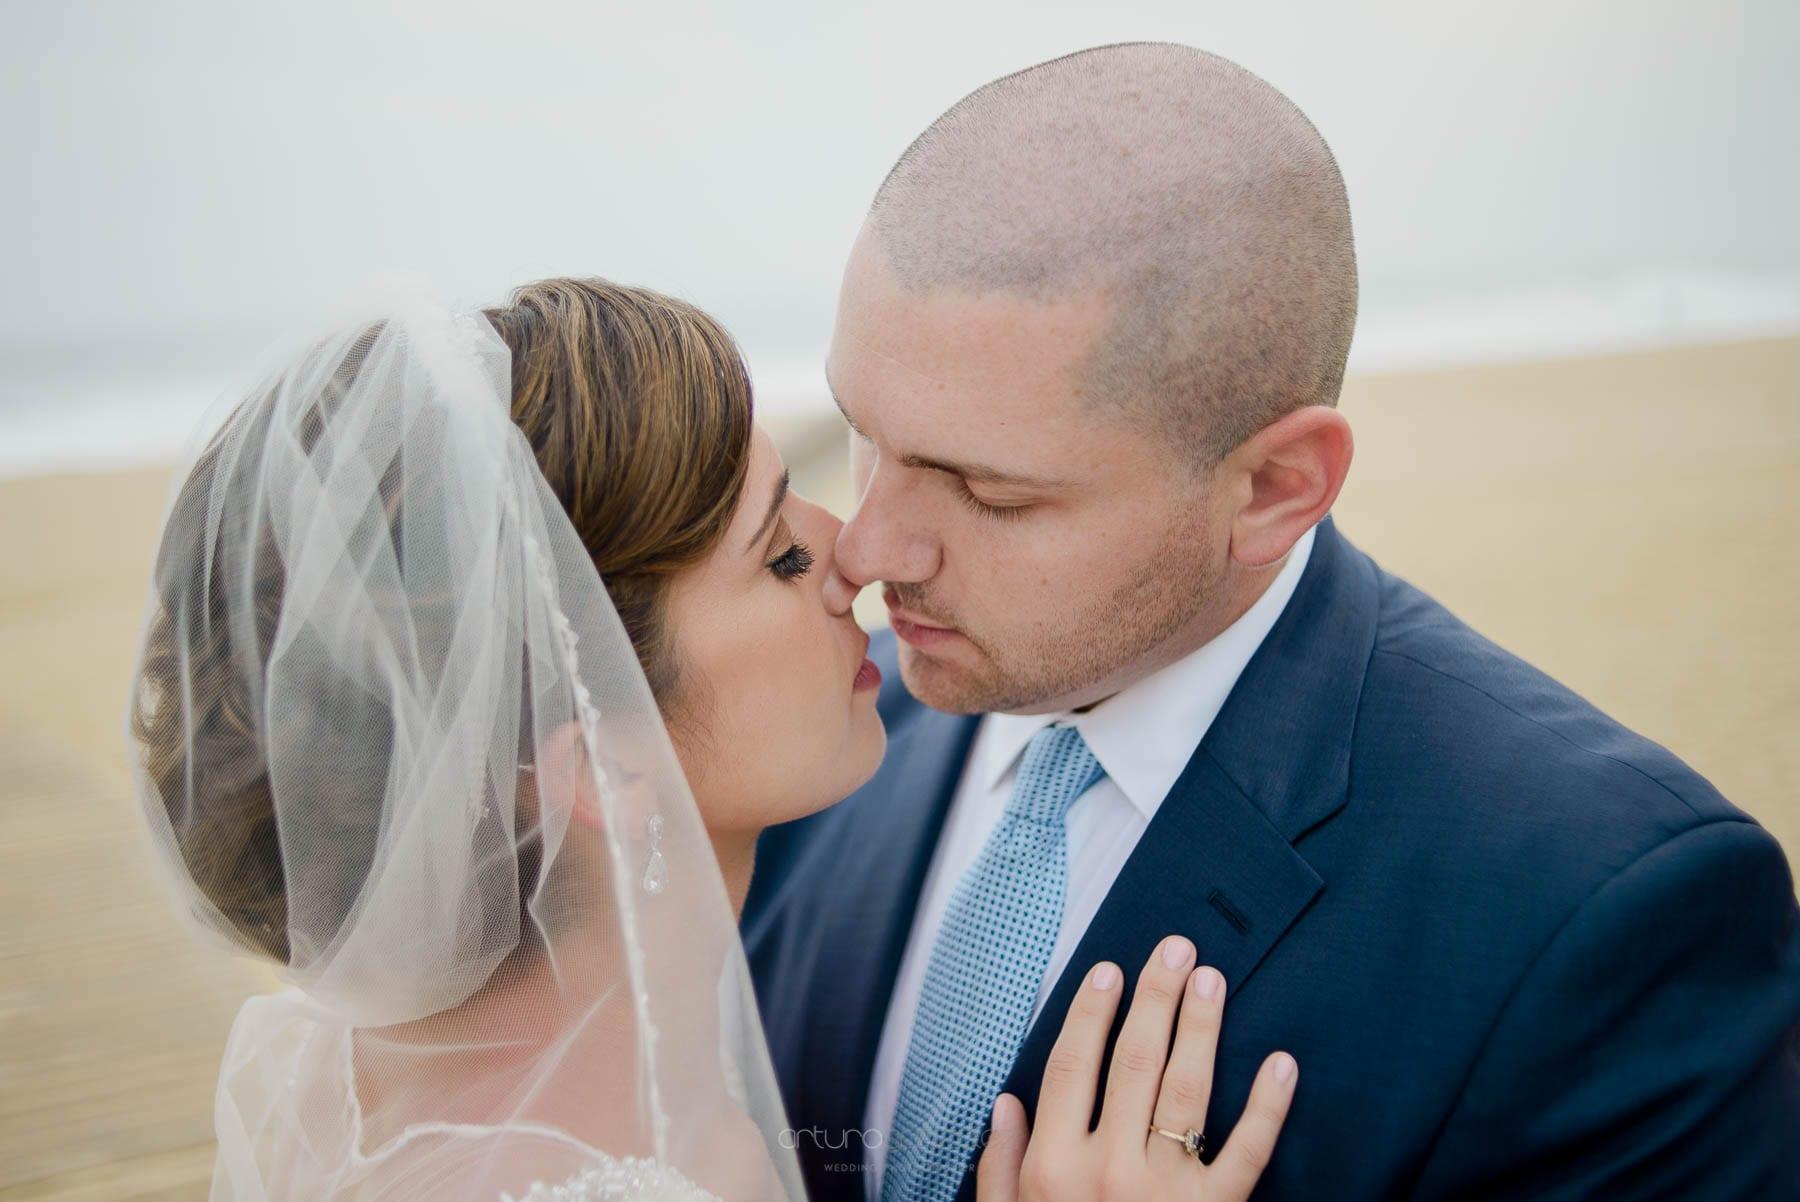 wedding-photos-pueblo-bonito-sunset-beach-4623